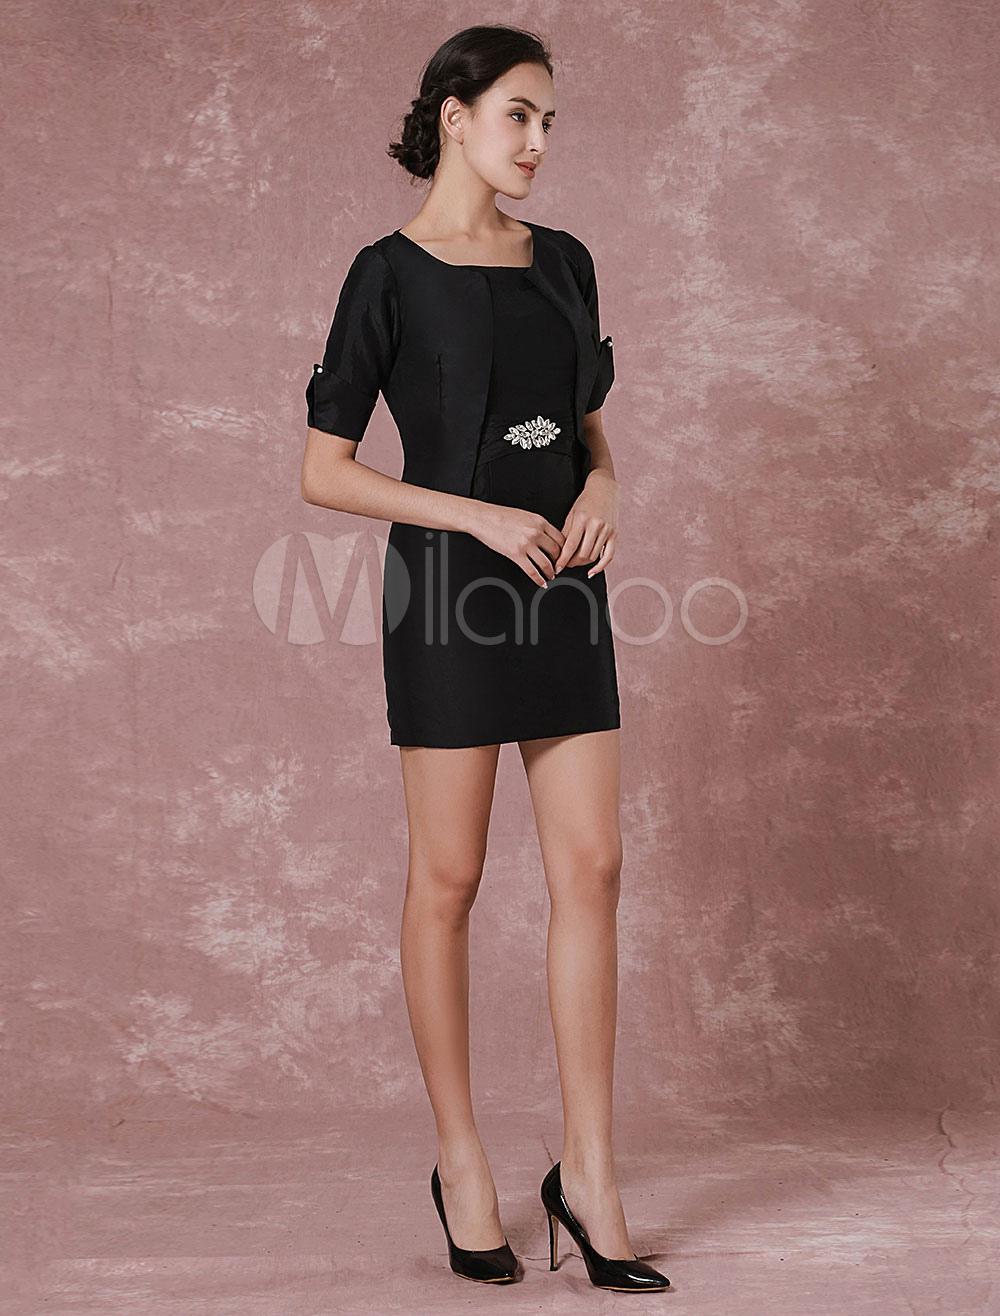 Black Mother Dress 2 Pieces Short Taffeta Cocktail Dress With Shrug Wedding Guest Dress photo